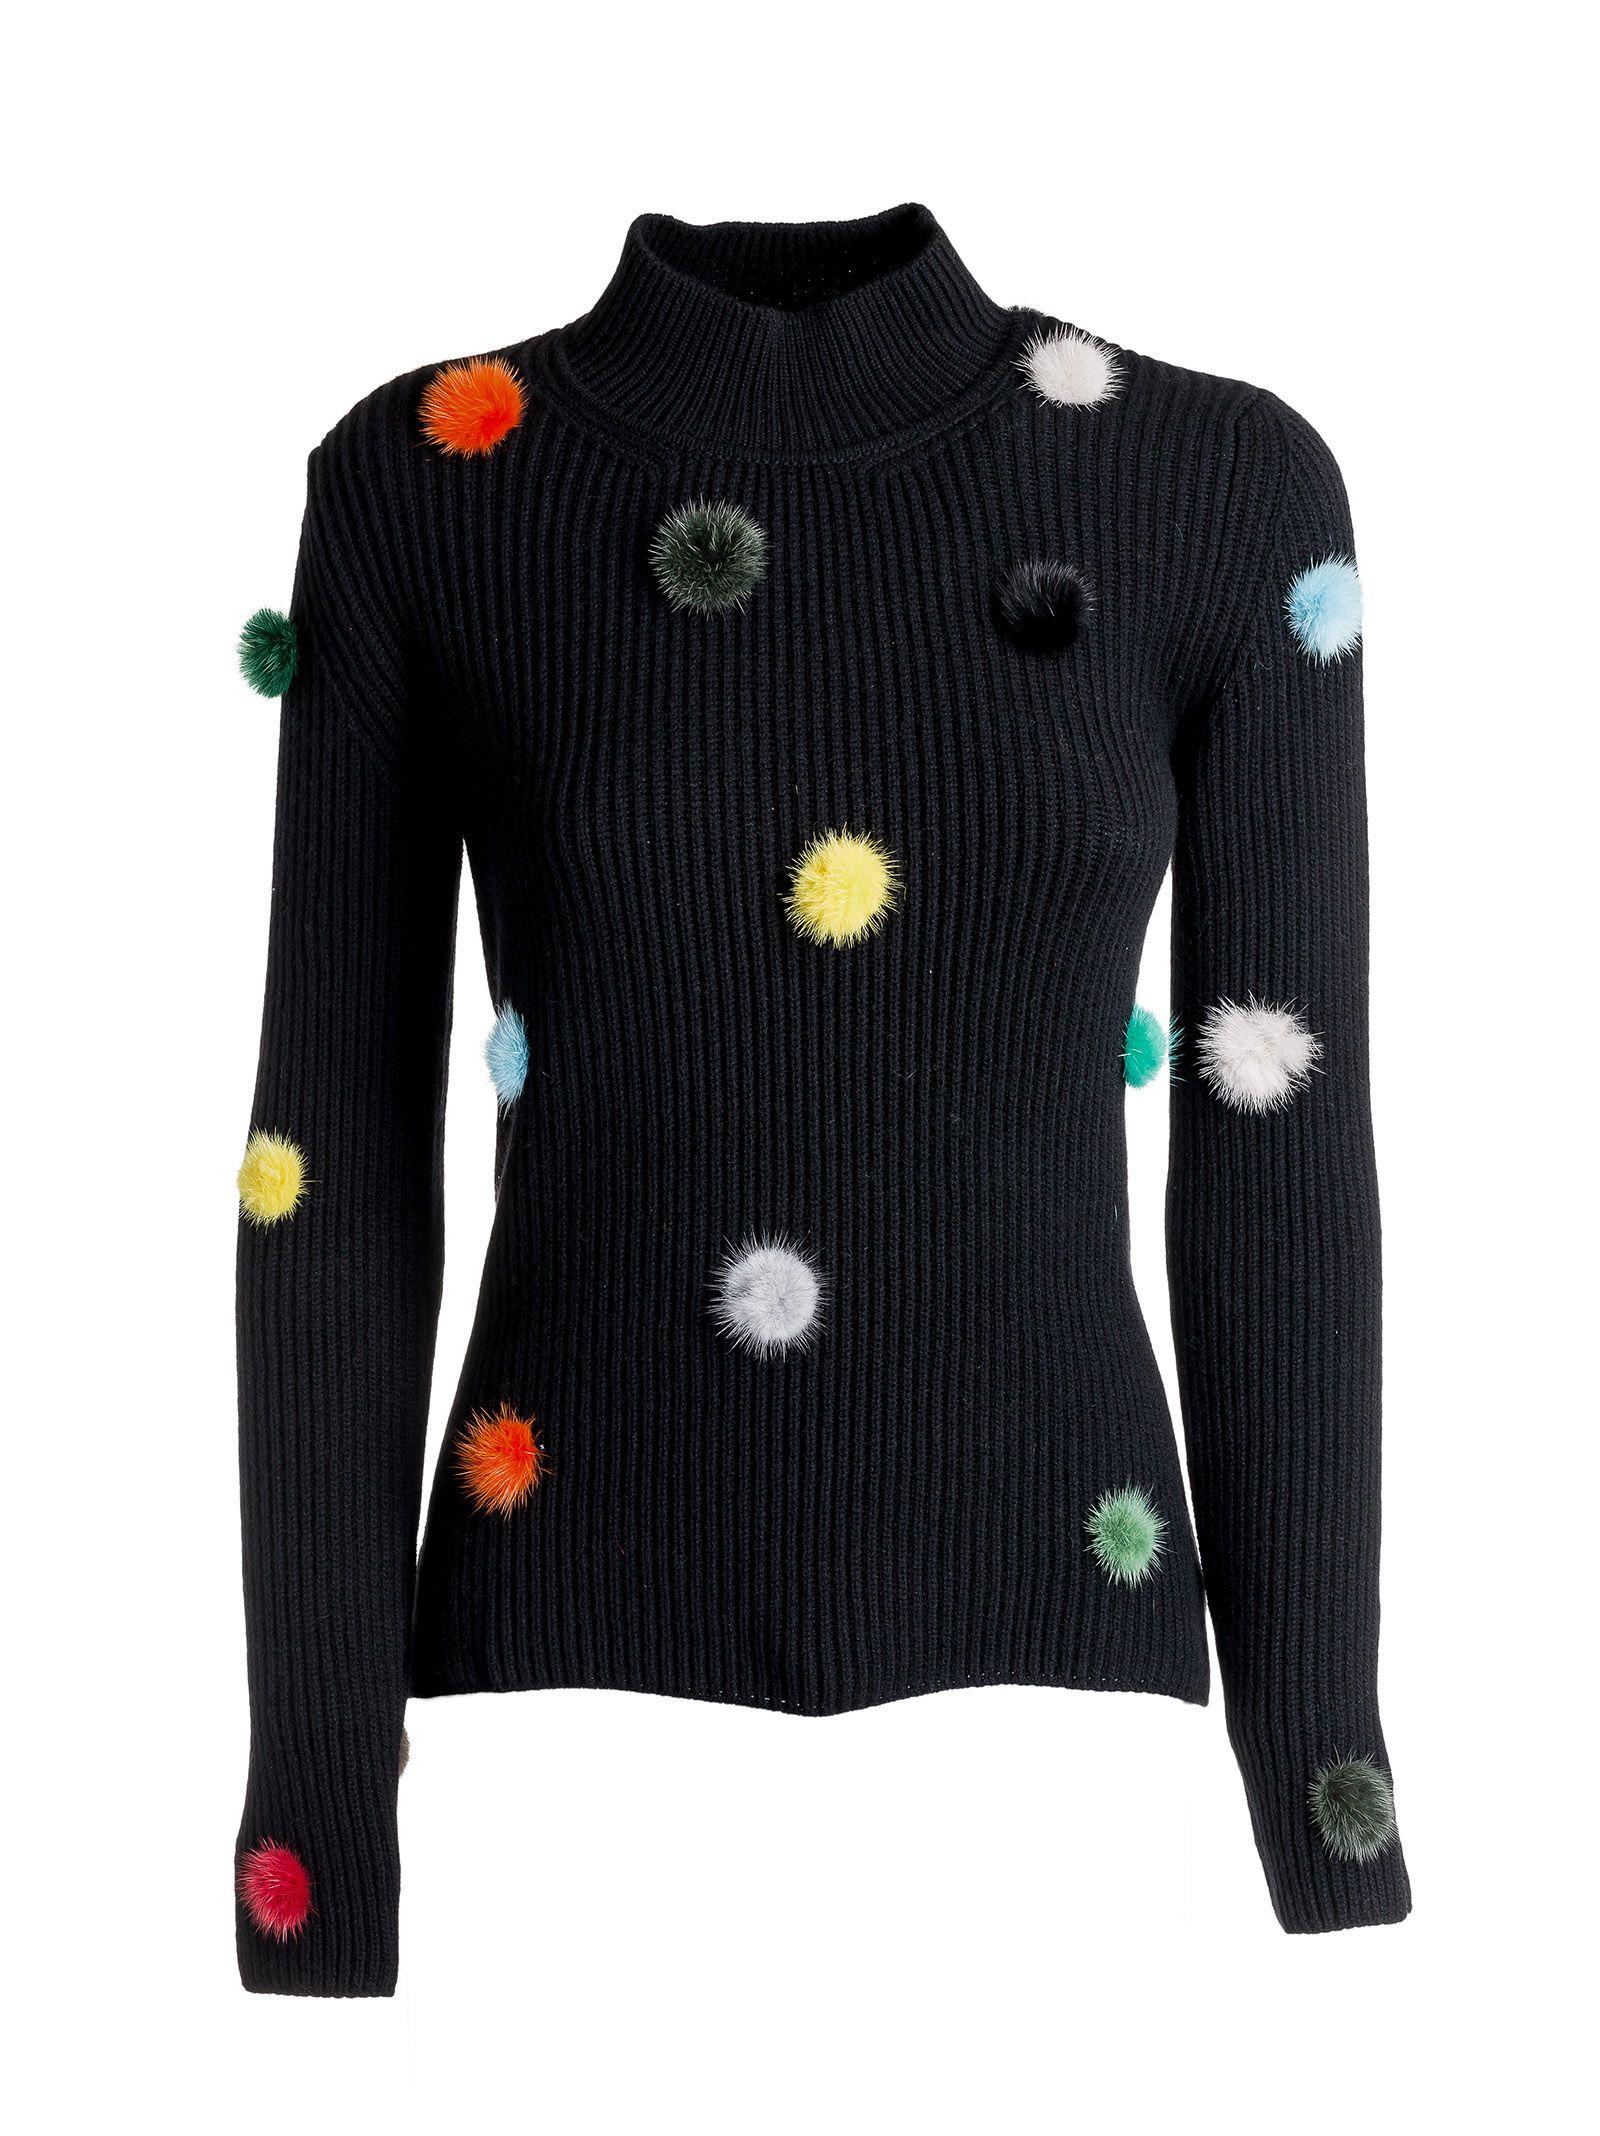 Fendi Knit Pom Pom Jumper